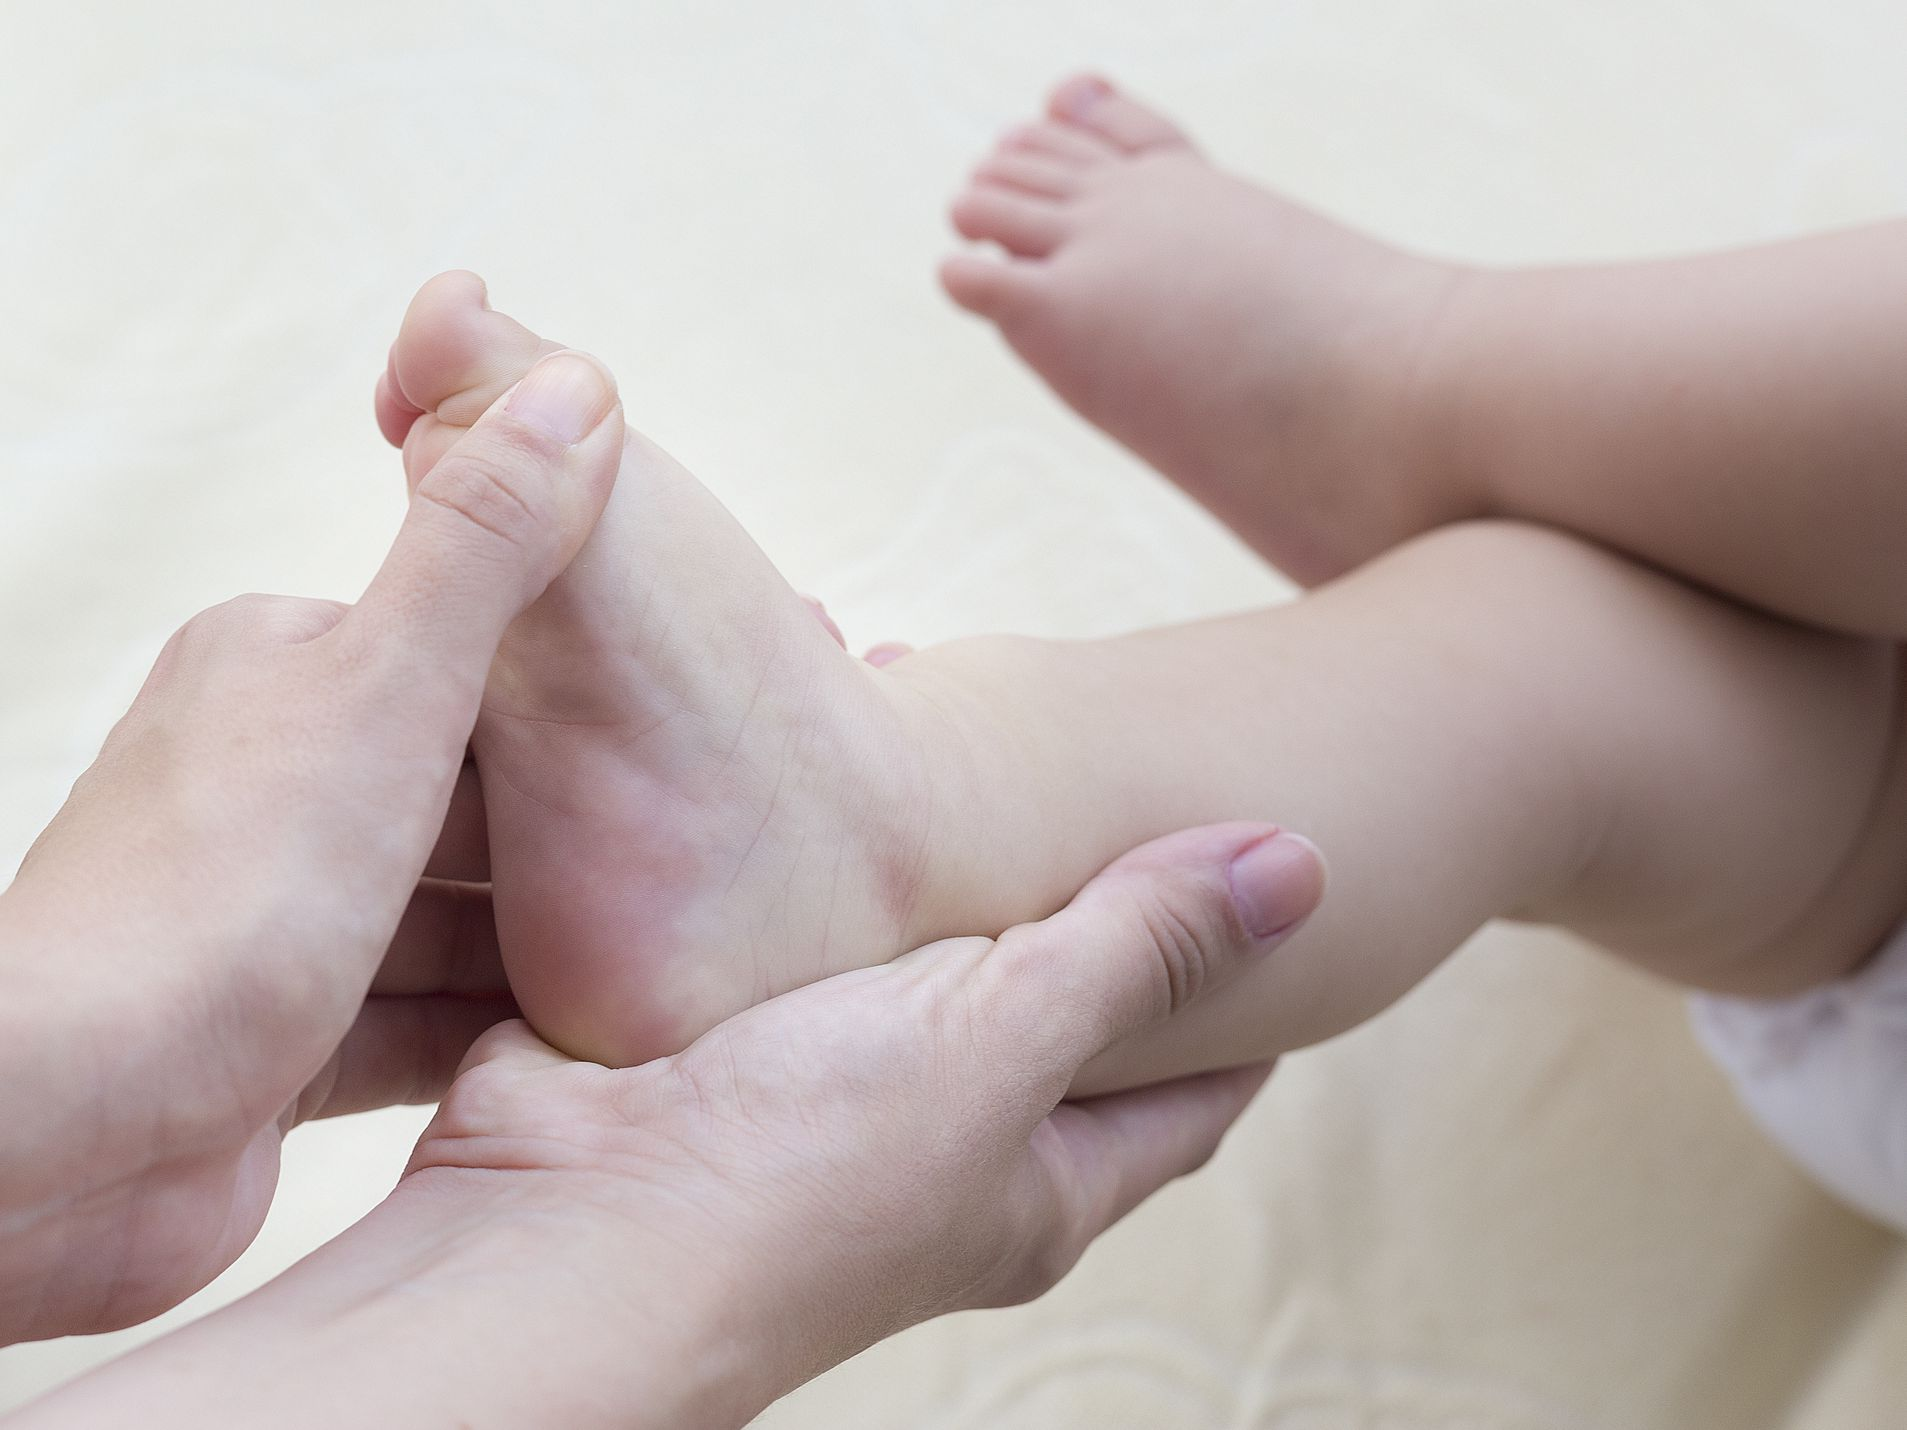 Newborn Baby Foot Problems and Deformities